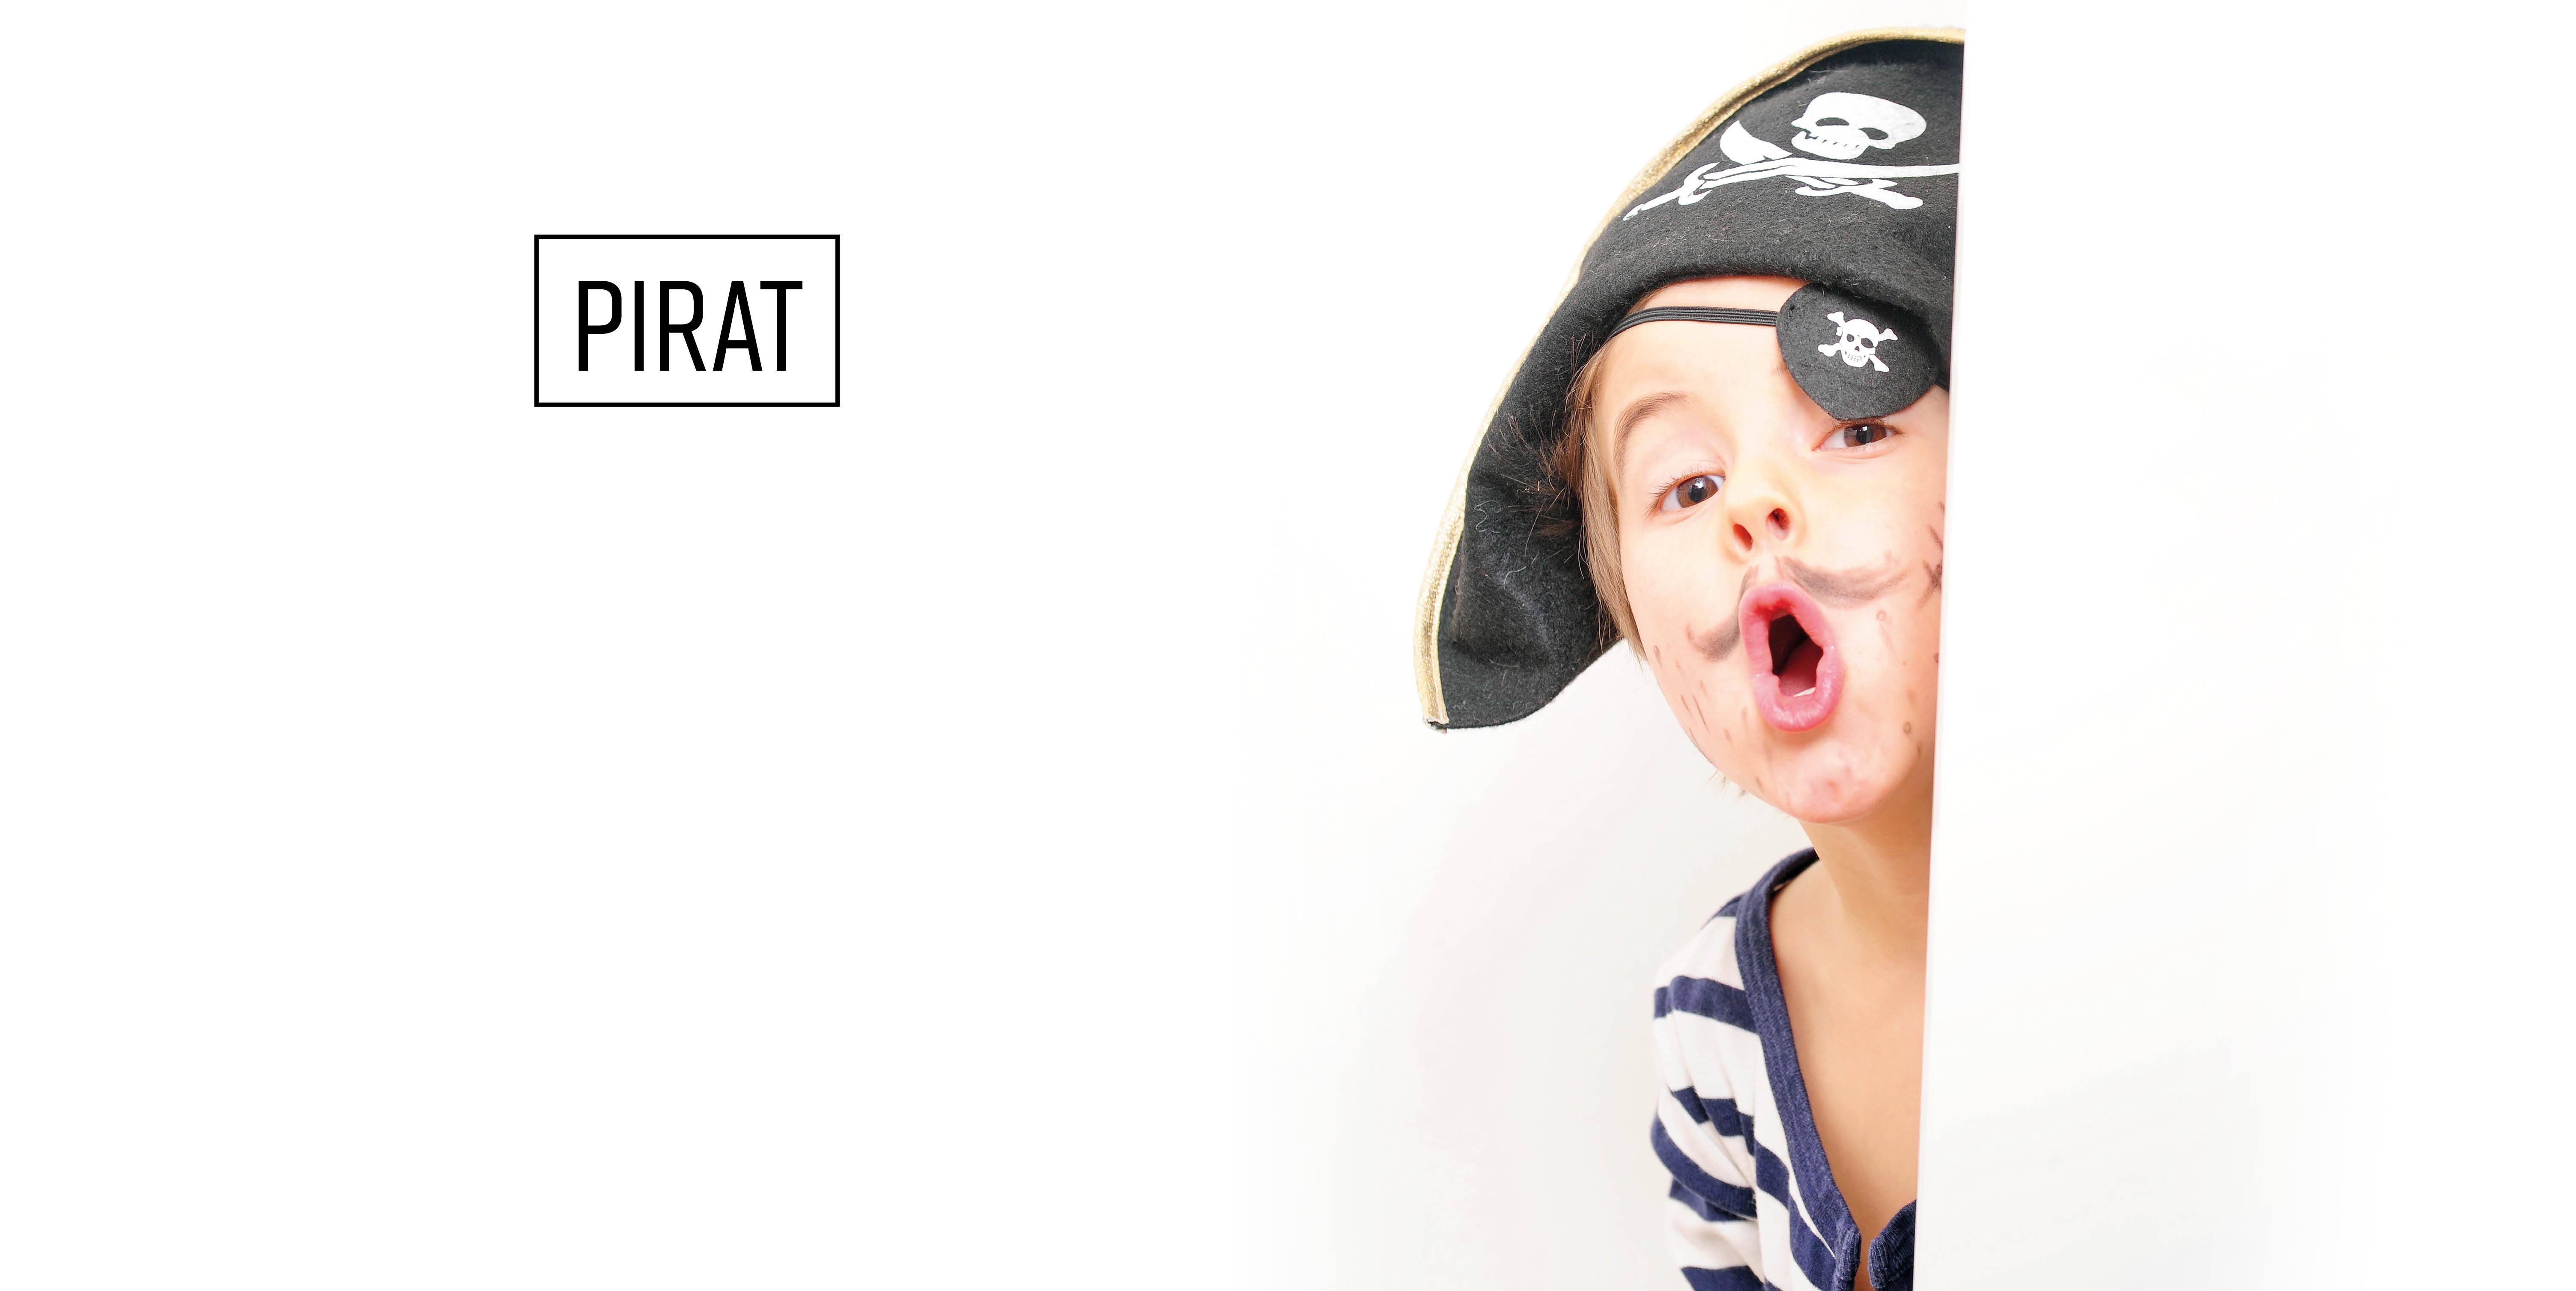 V1 Frontslideshow Pirat